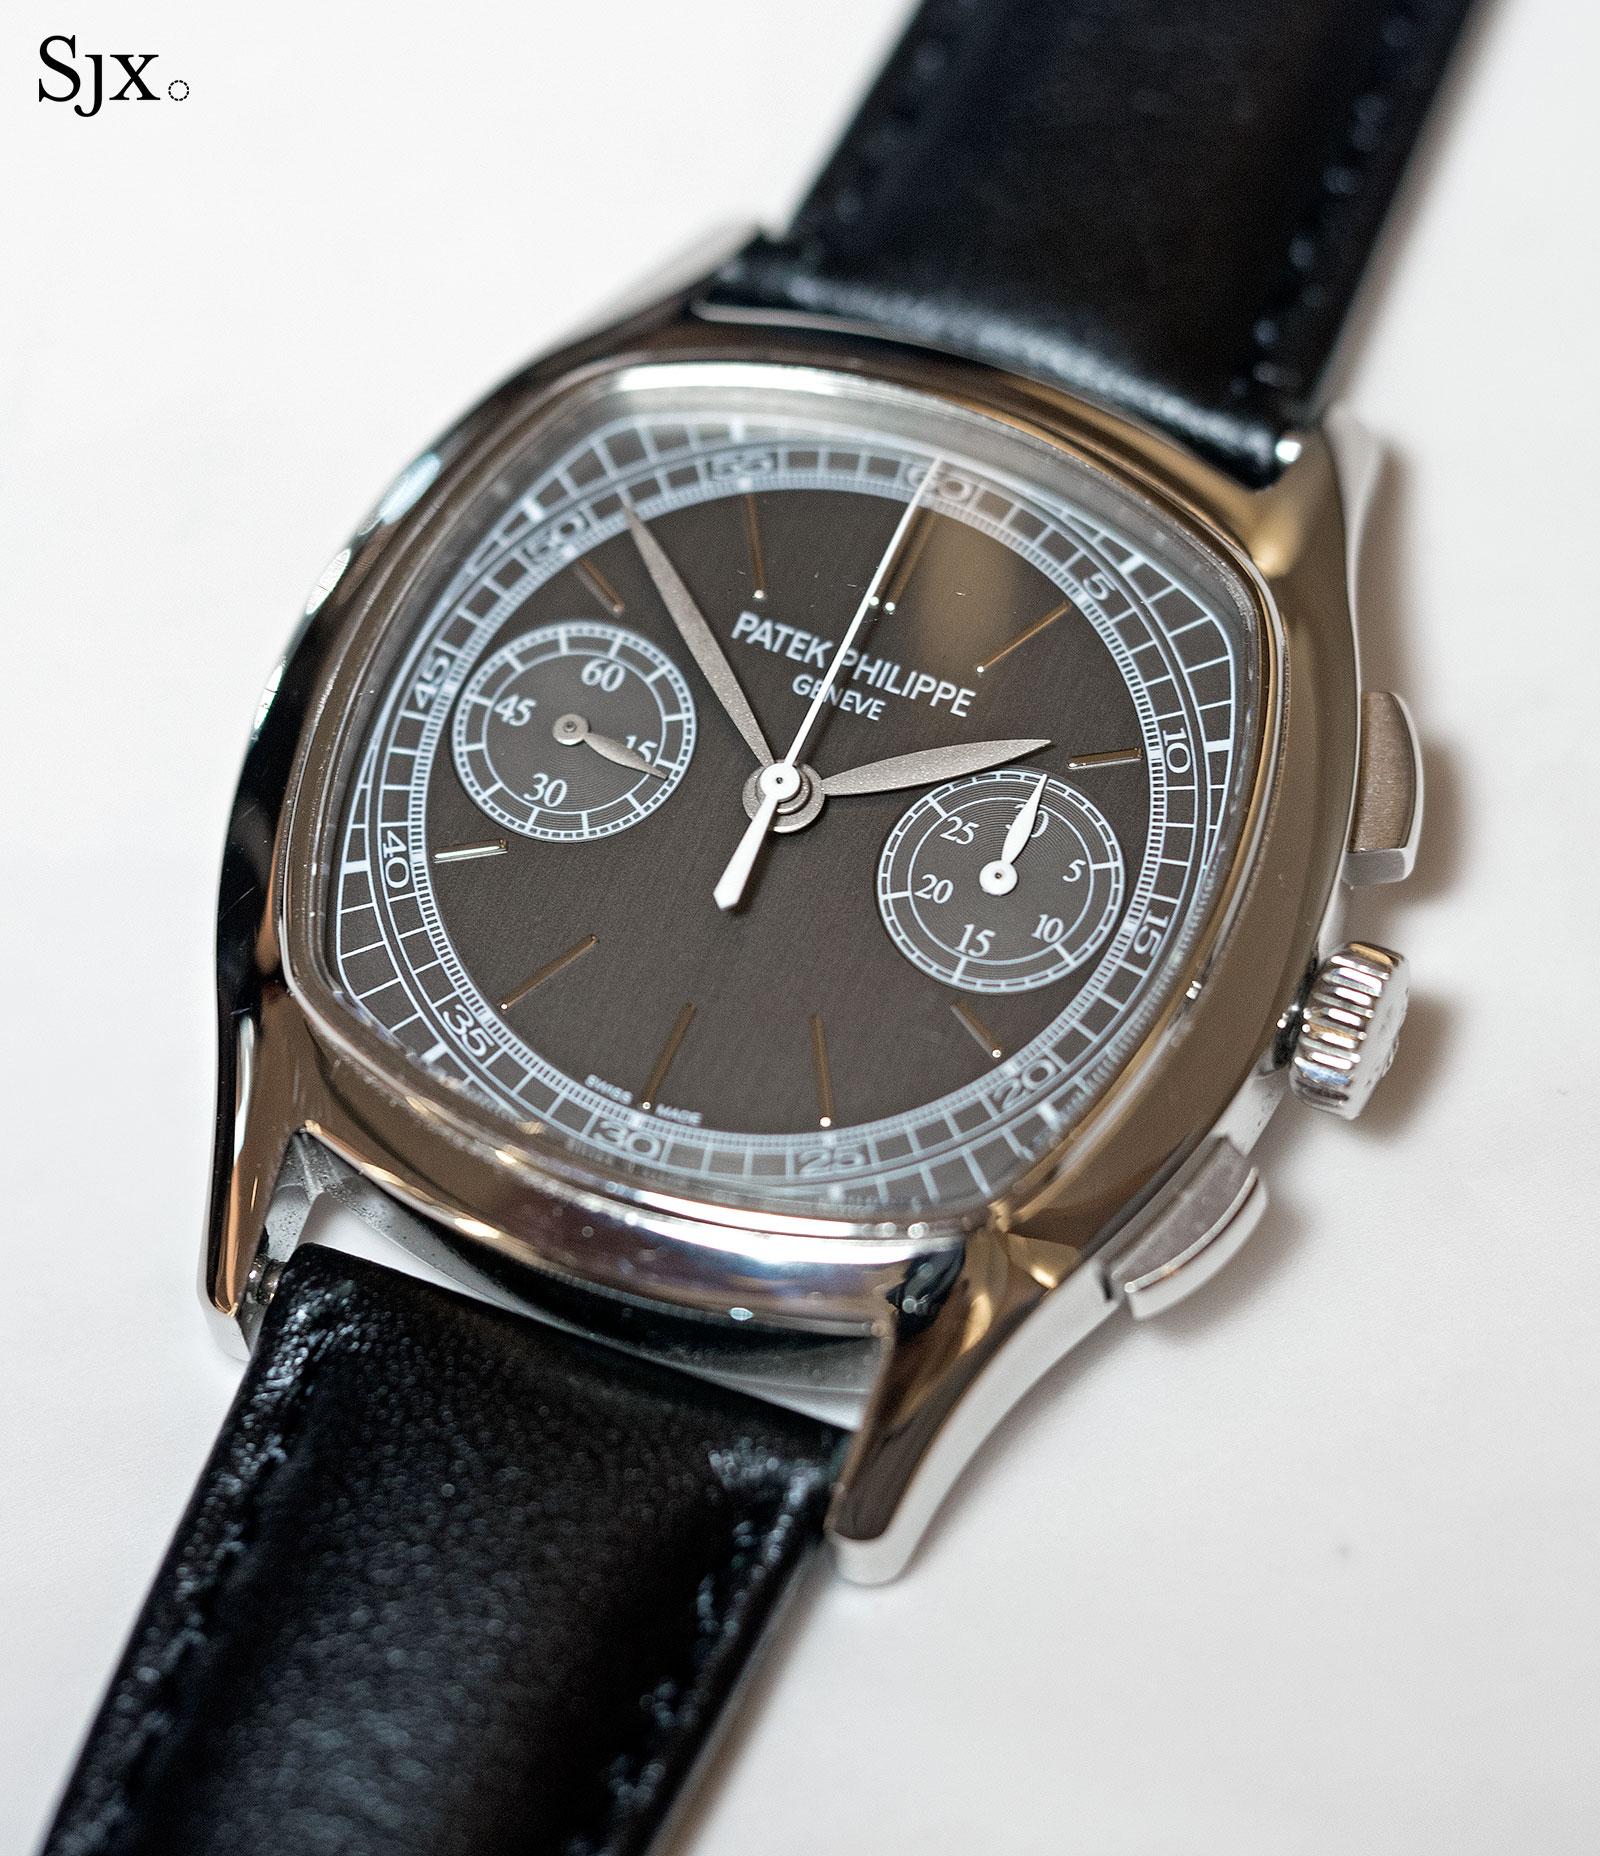 Patek Philippe 3670 chronograph steel 1